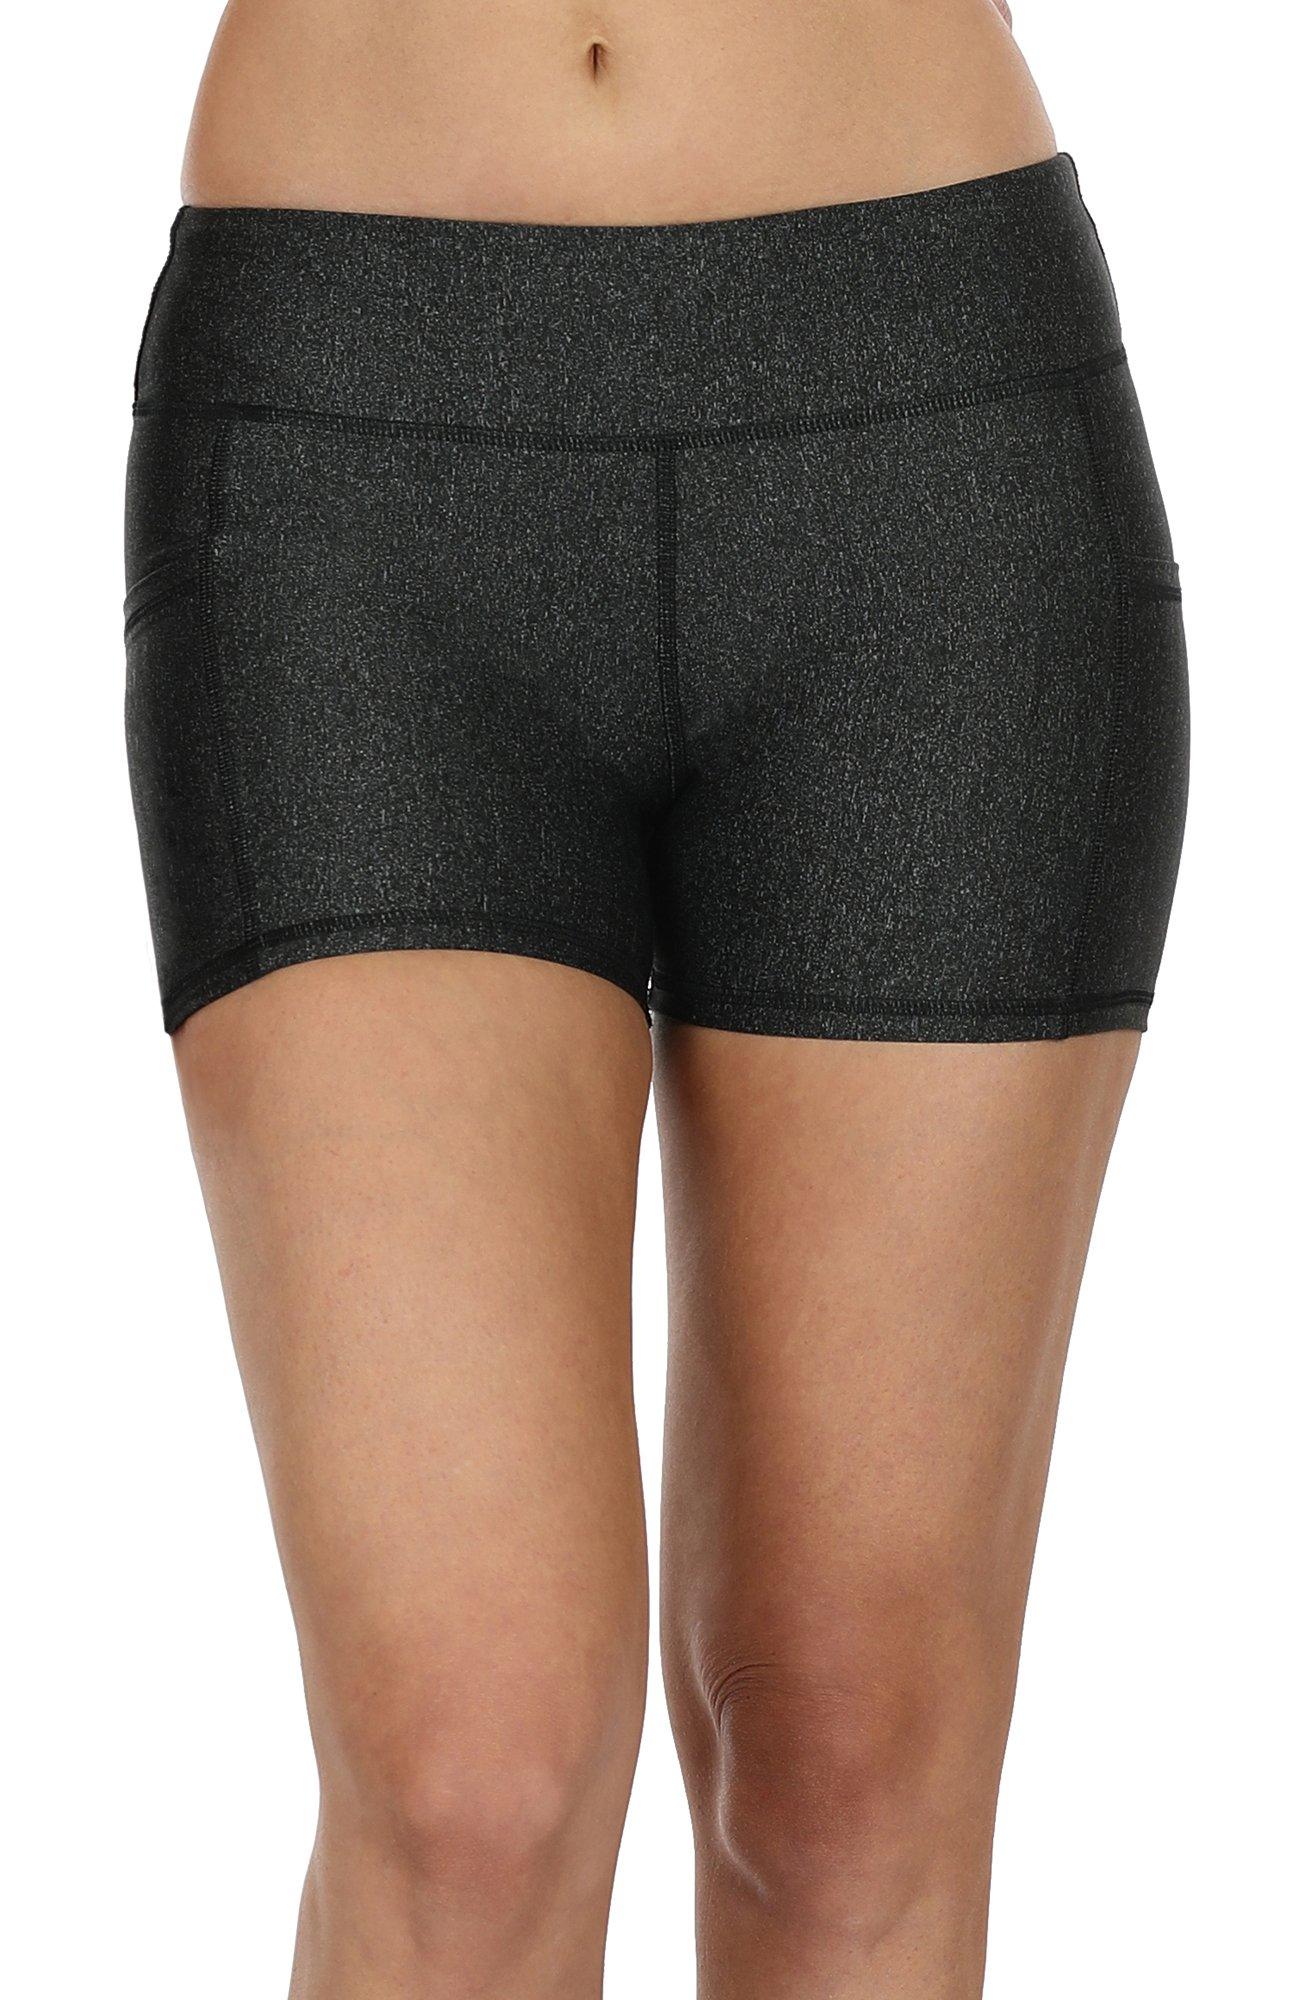 icyzone Workout Running Shorts Women - Yoga Exercise Lounge Athletic Activewear Compression Shorts Pockets & Drawstring (S, Black)